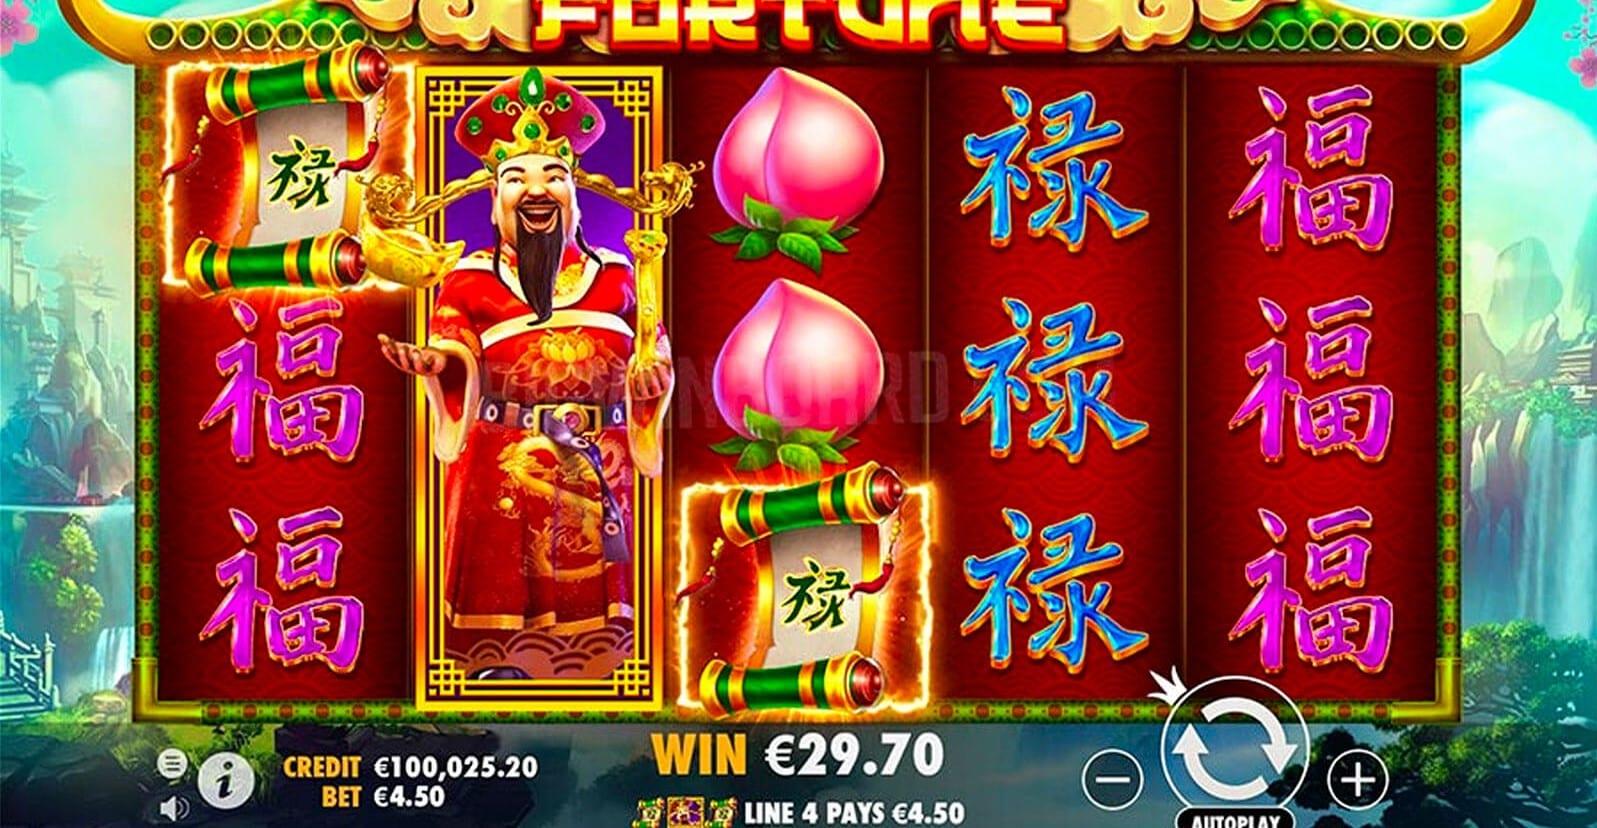 Three Star Fortune Free Slots